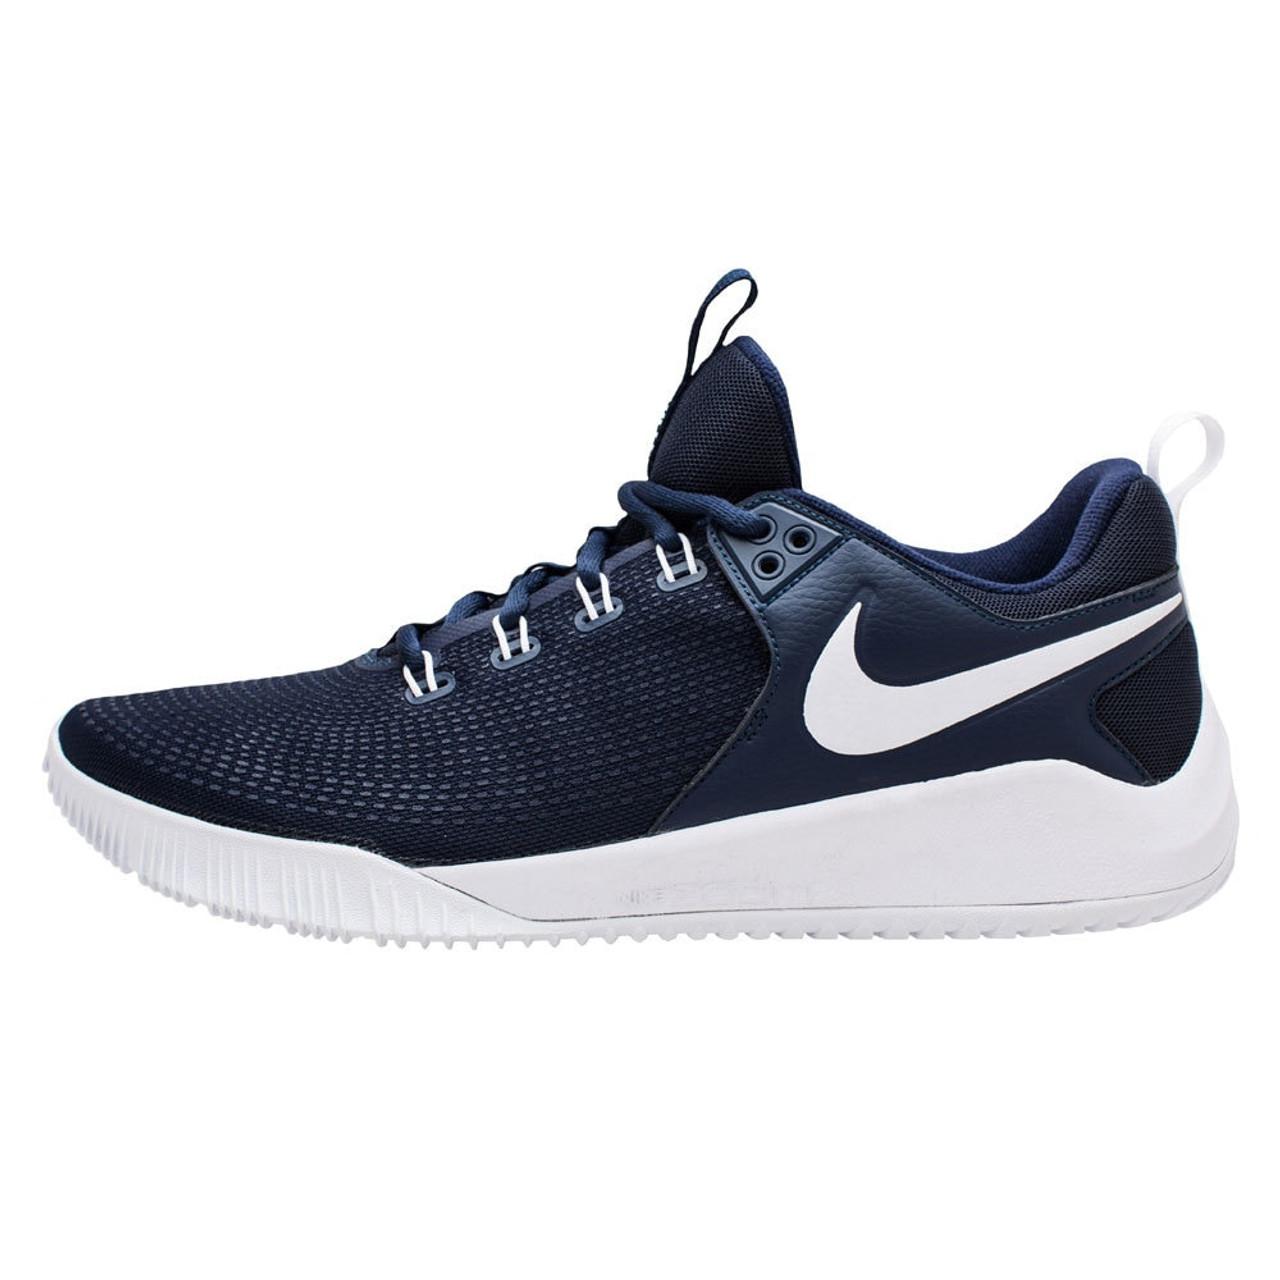 Nike Men's Zoom HyperAce 2 Navy